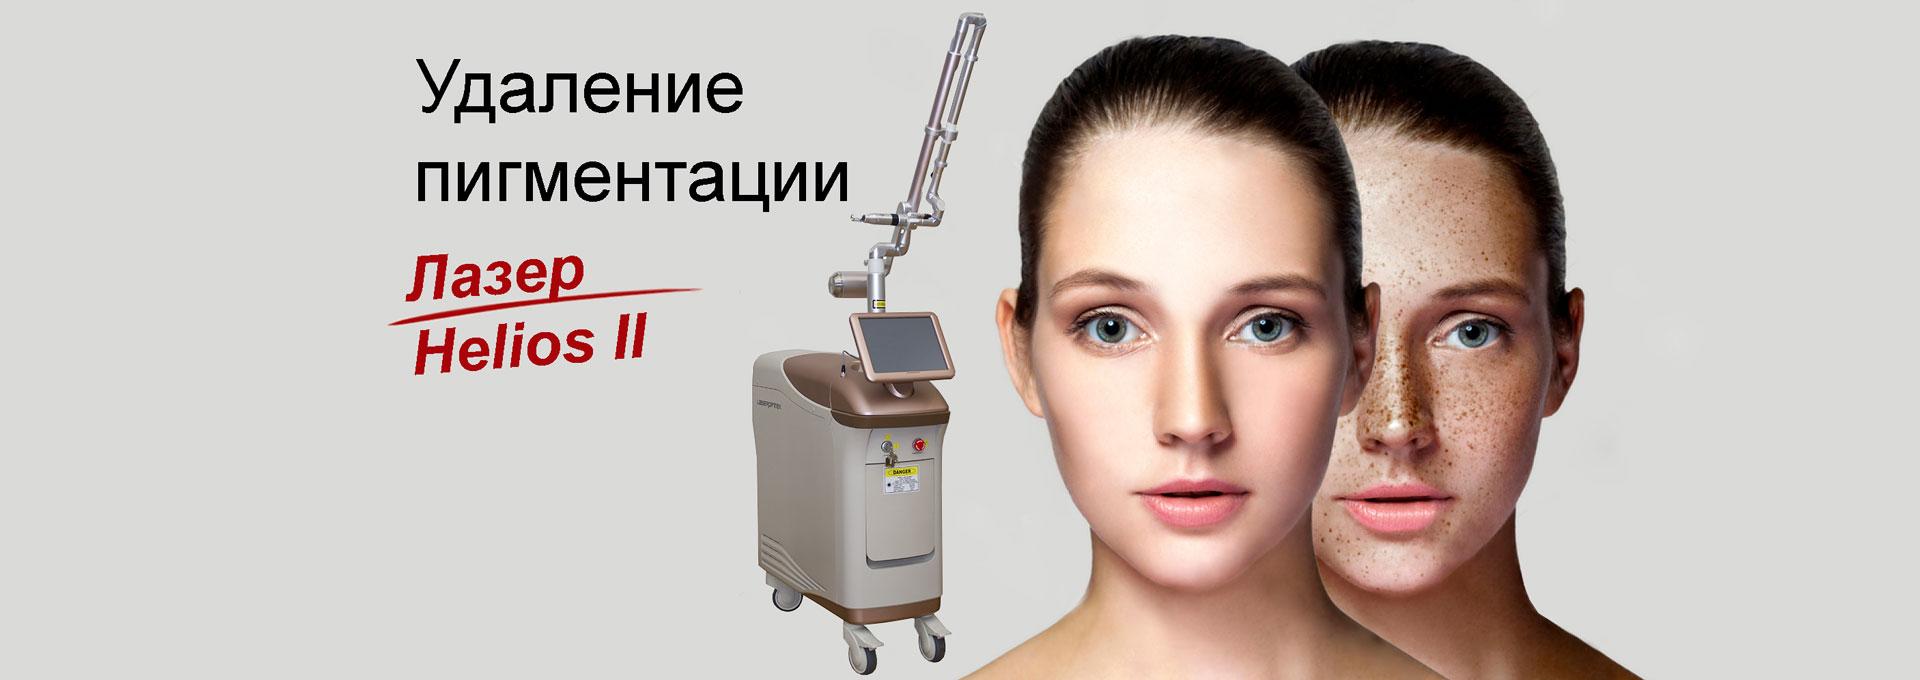 pigmetation-delete-laser-helios-2